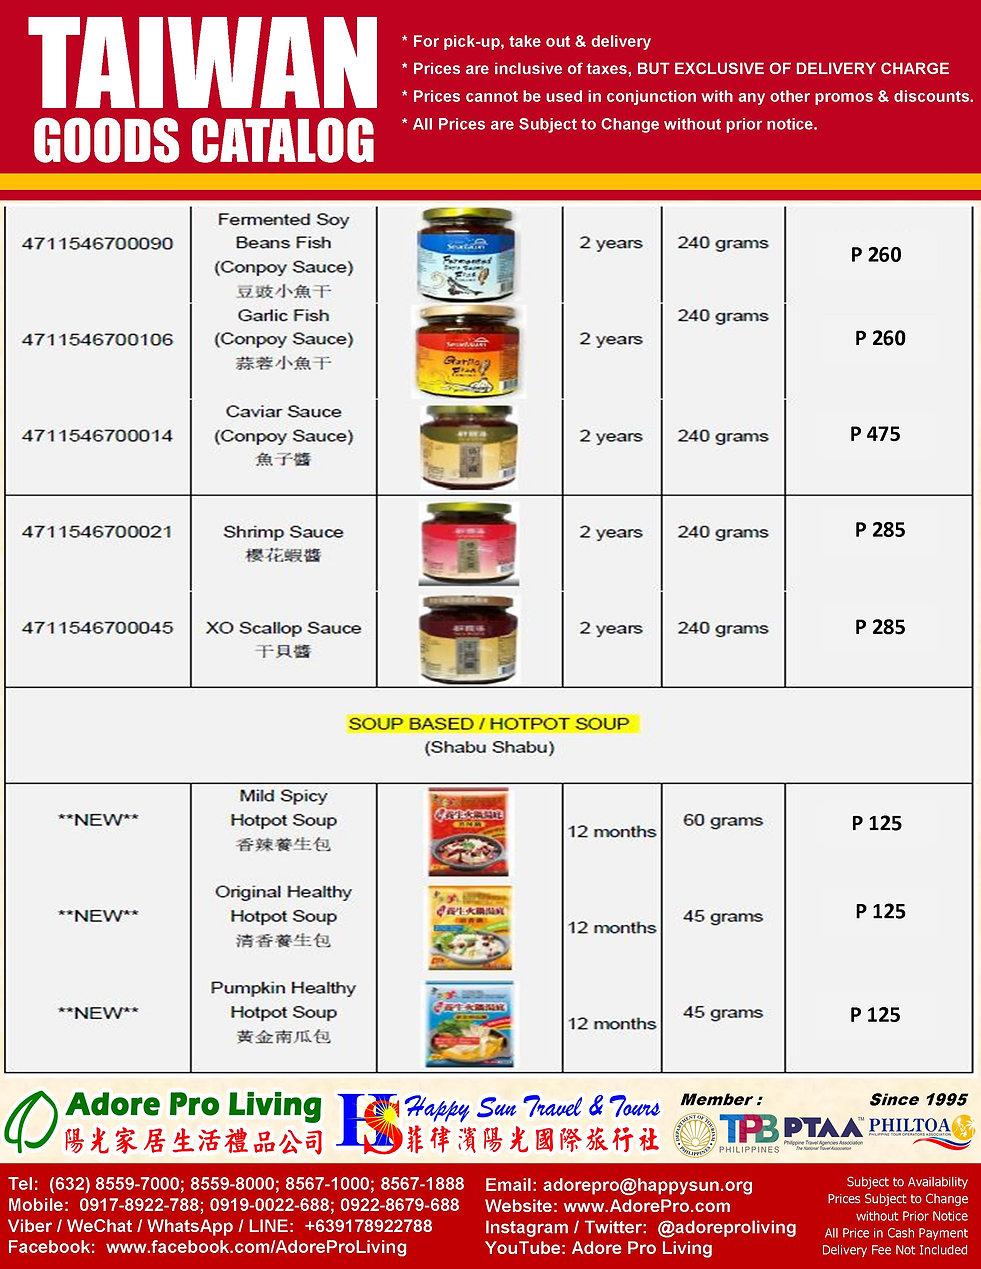 P15_Taiwan Goods Catalog_202009119.jpg